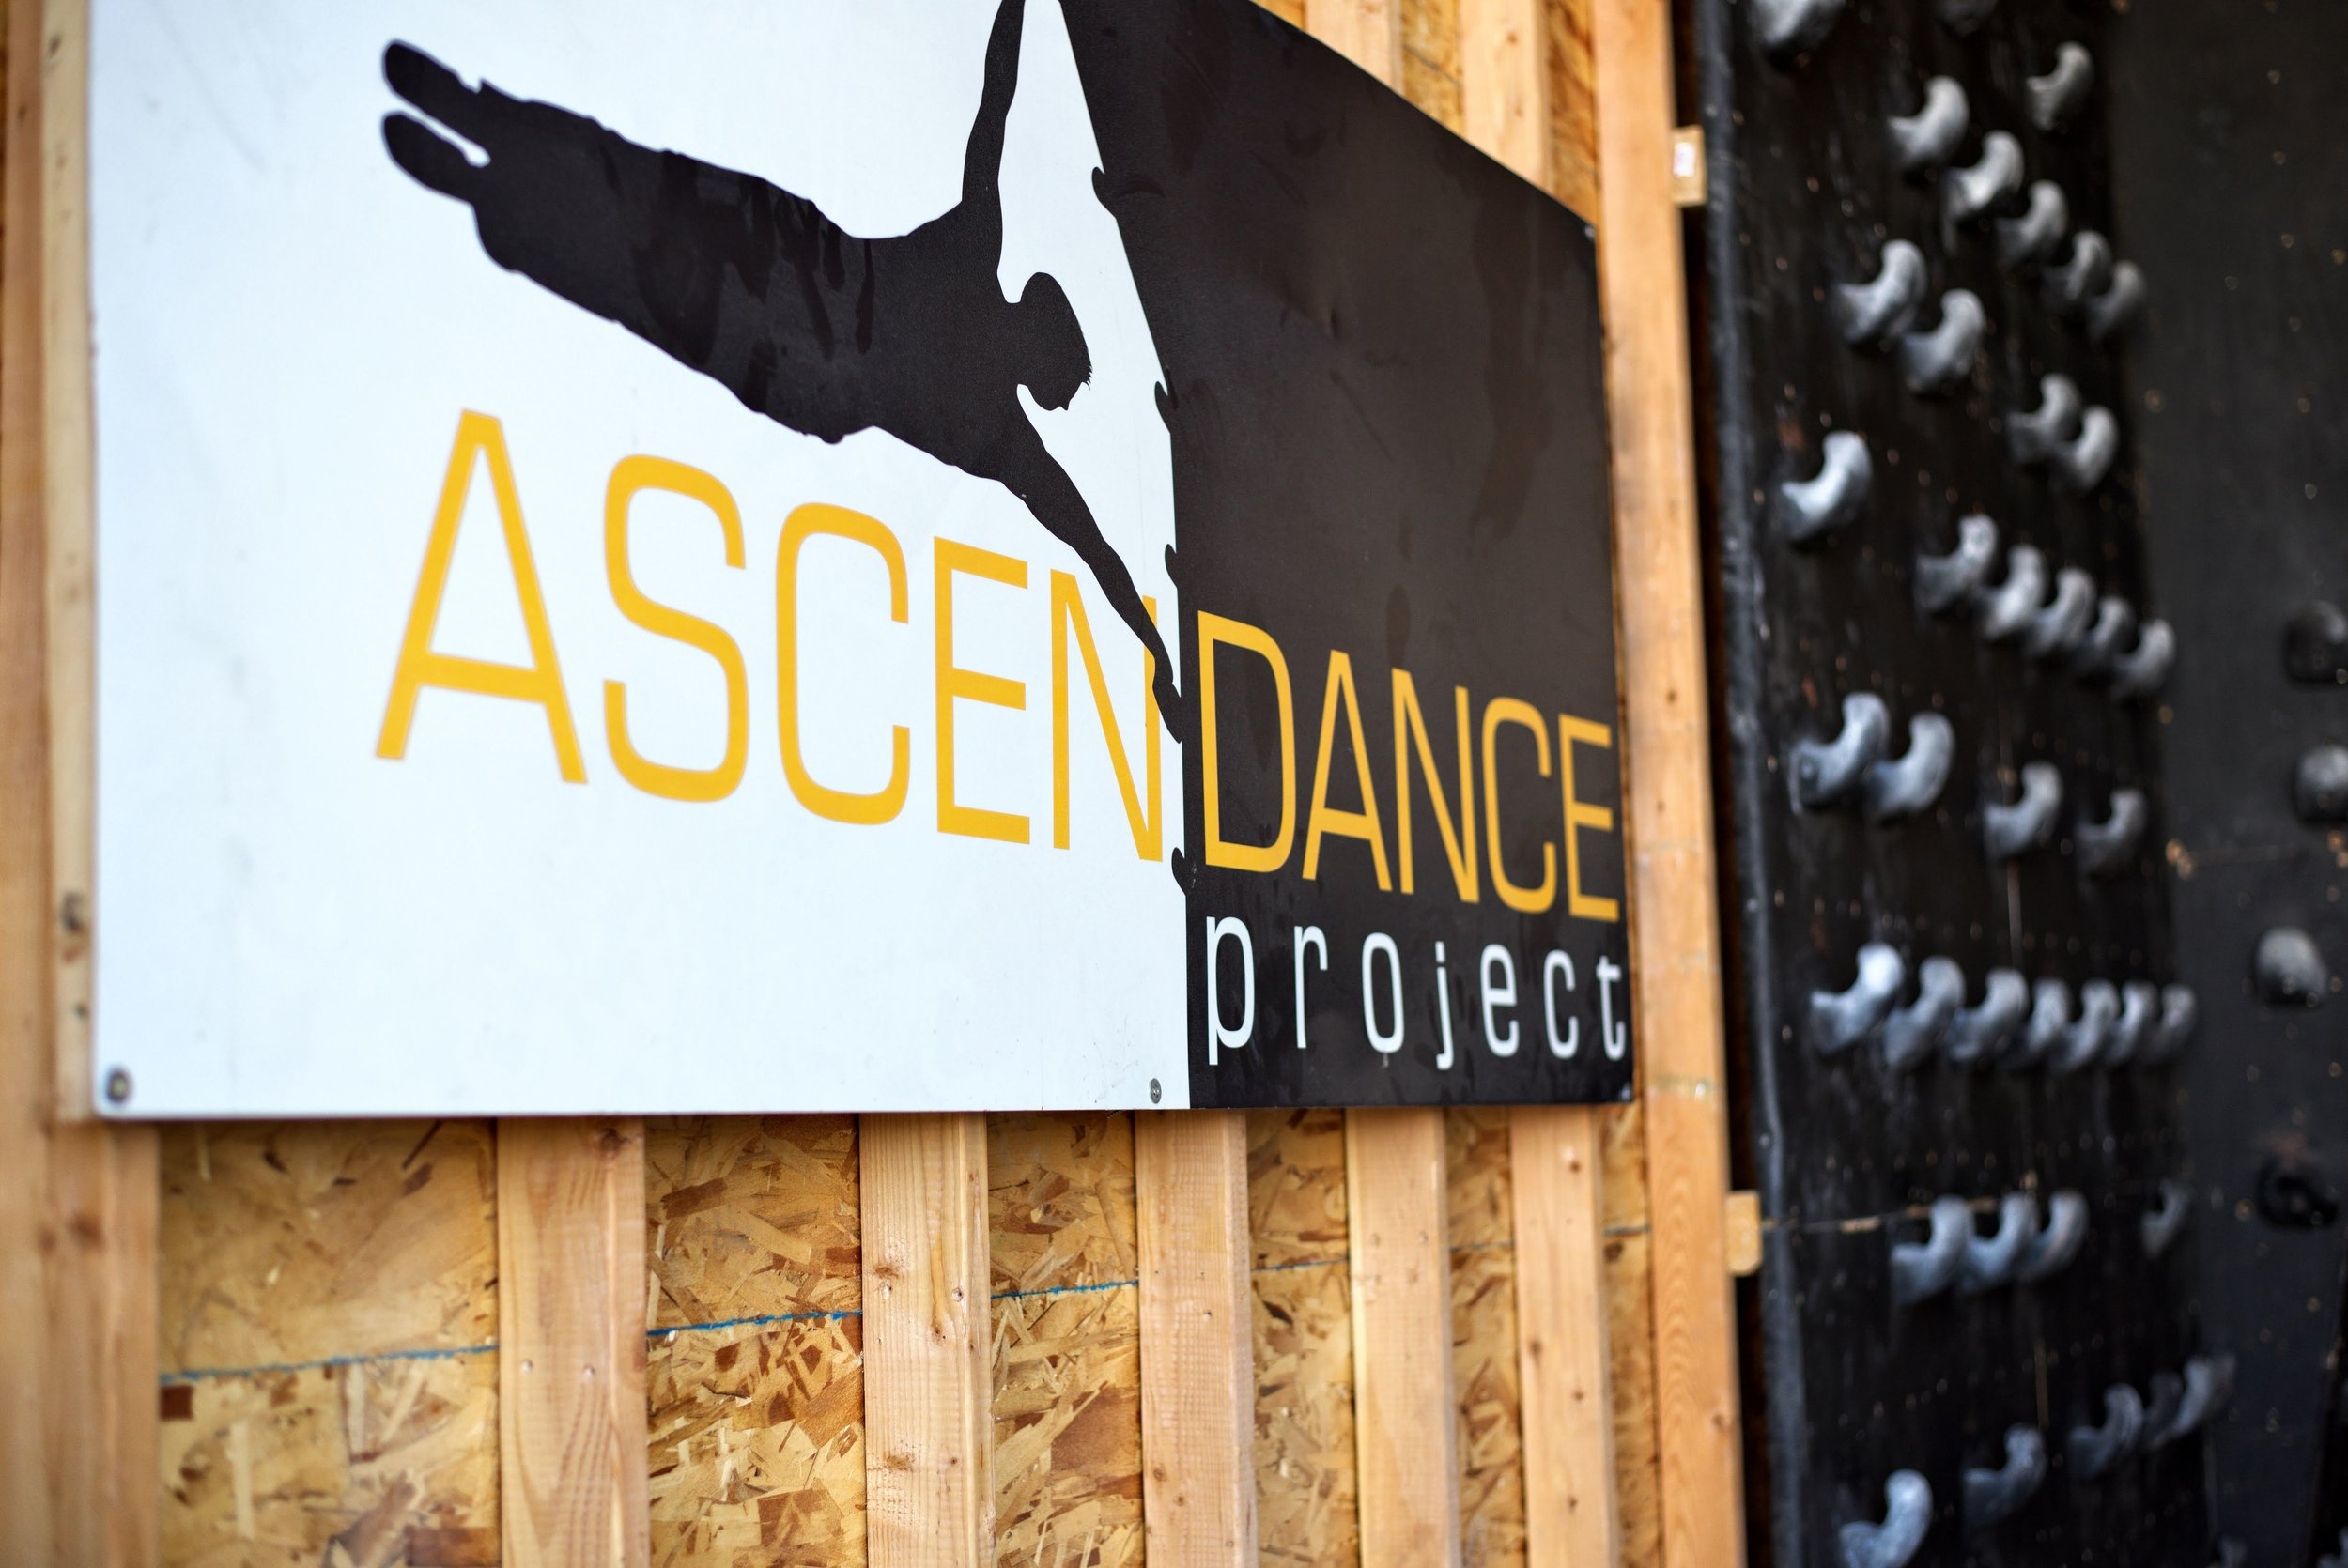 Fractured Frame Photography - AscenDance (1).jpg